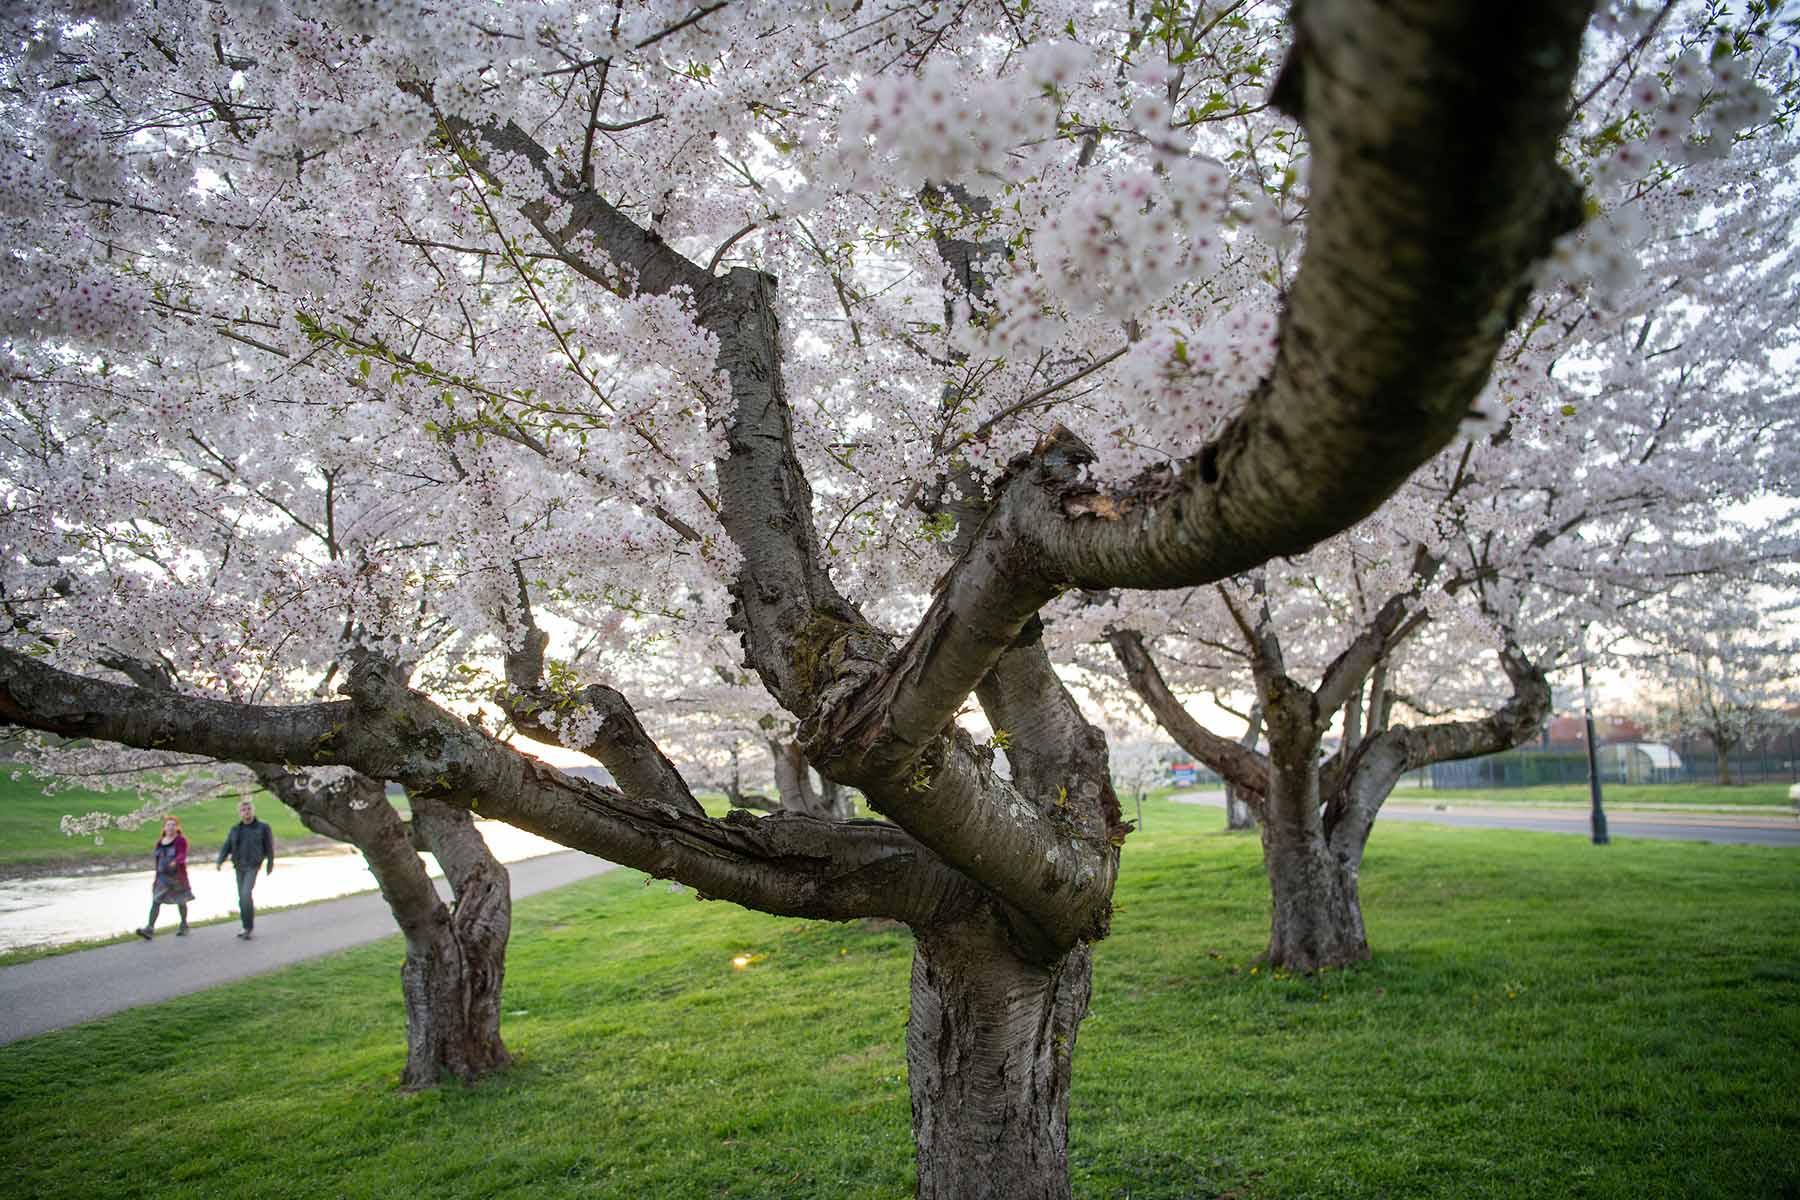 Ohio S Renowned Cherry Blossom Trees